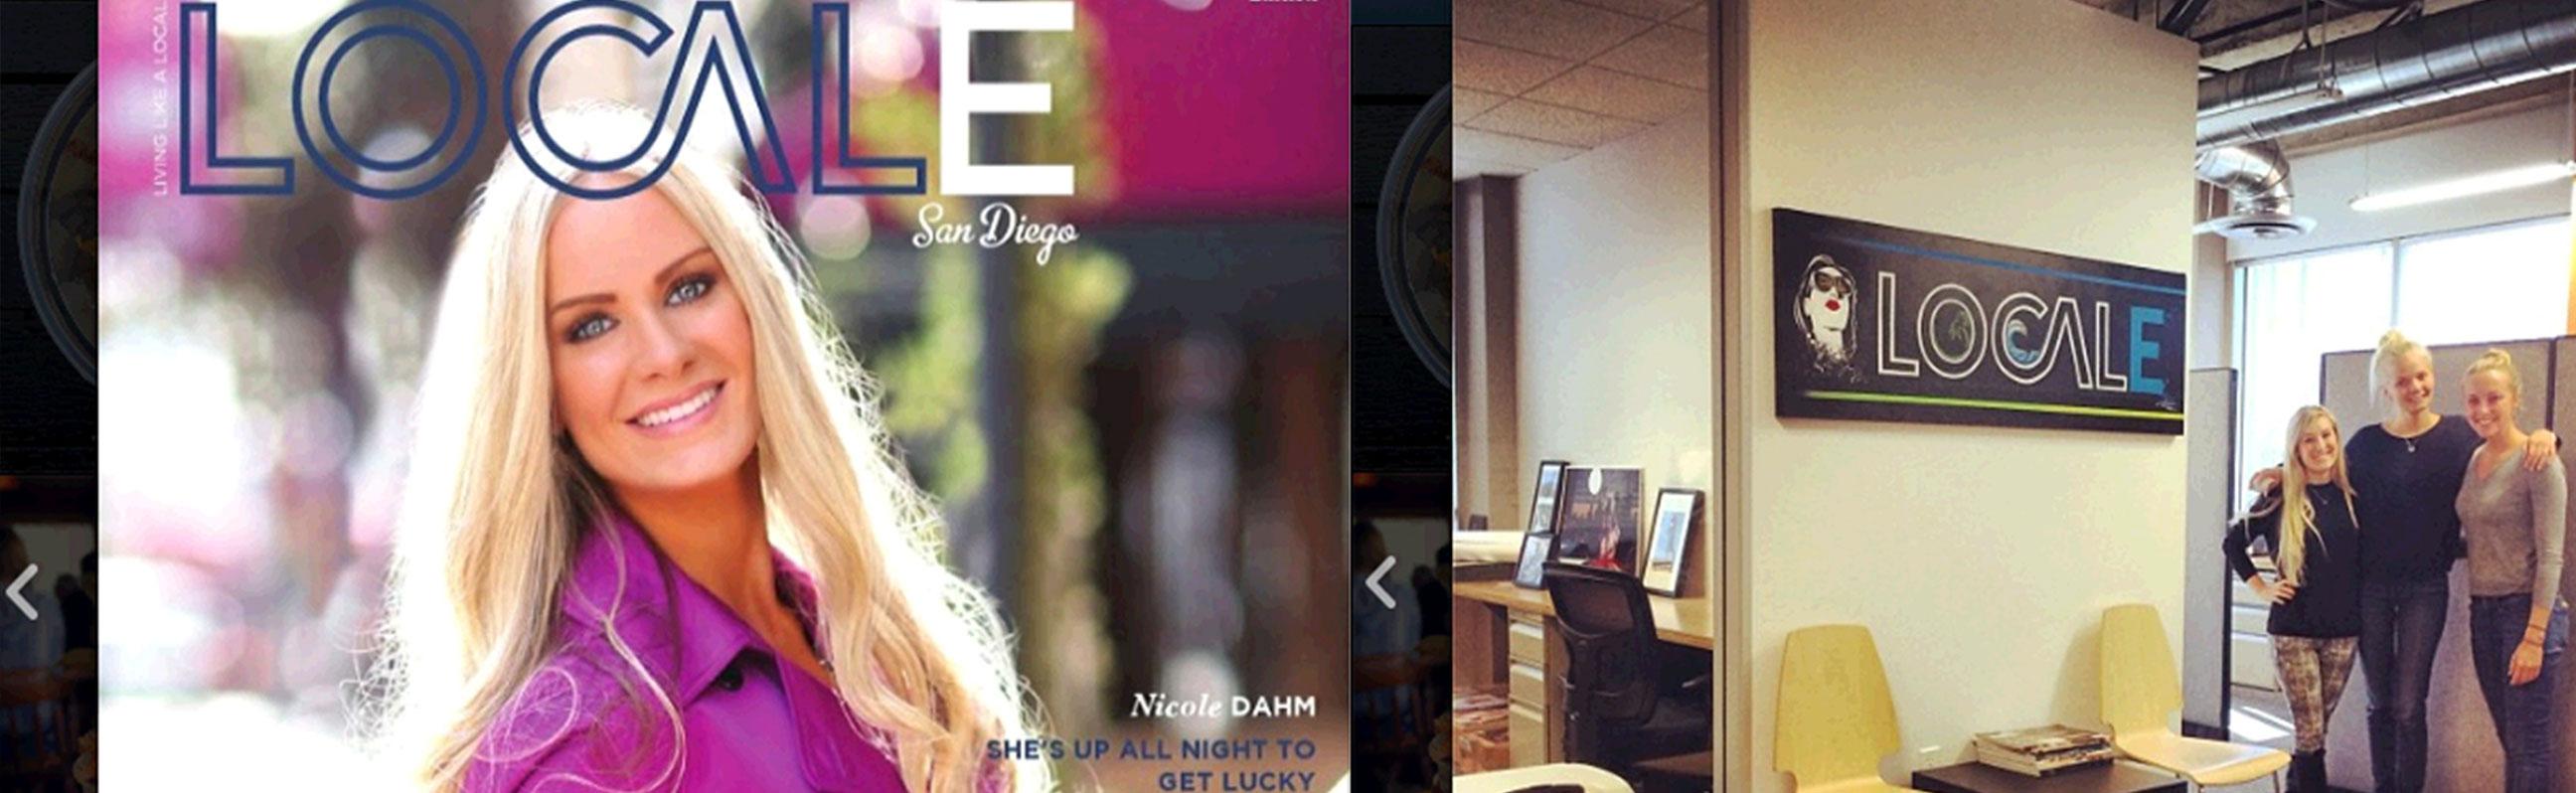 Locale Magazine's Start Up Story